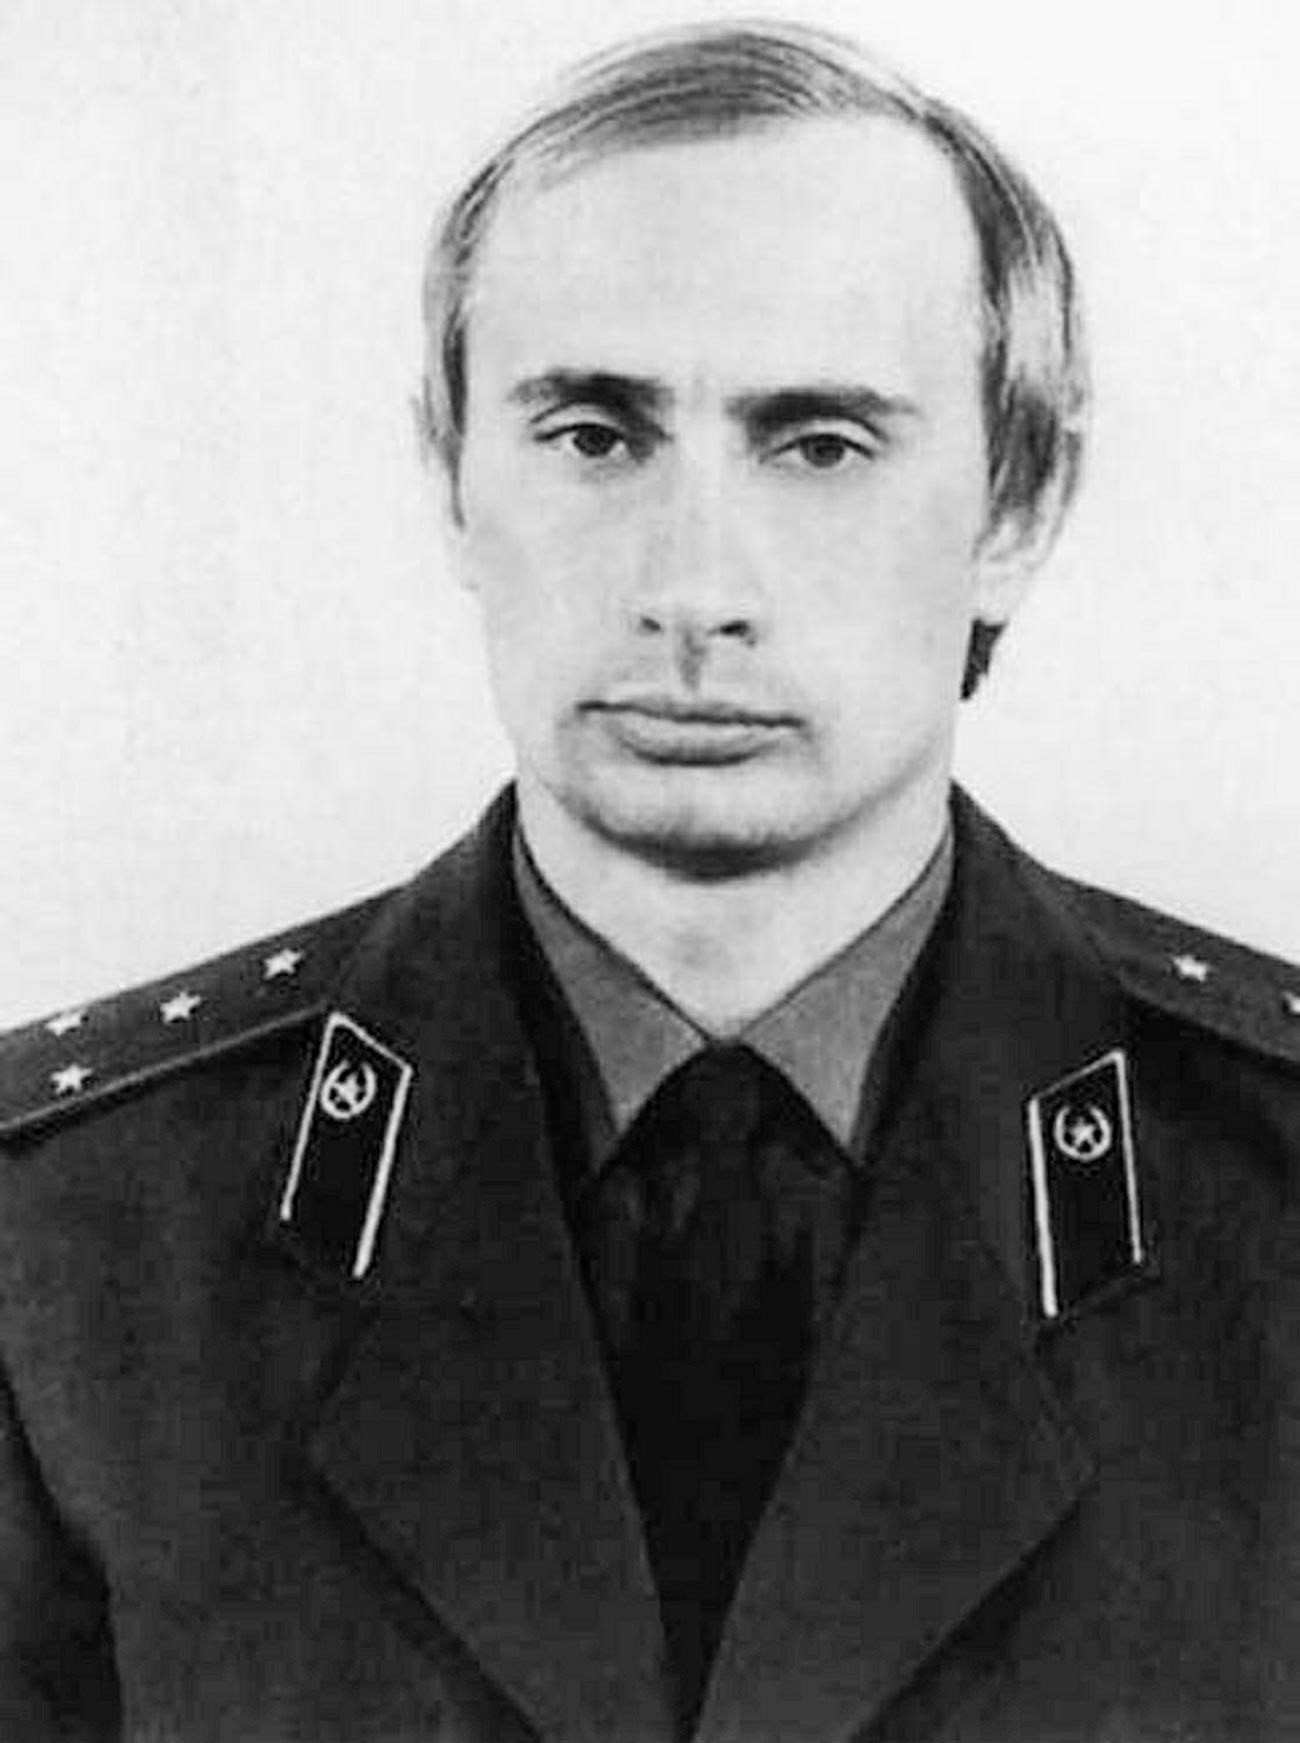 El joven Vladímir Putin